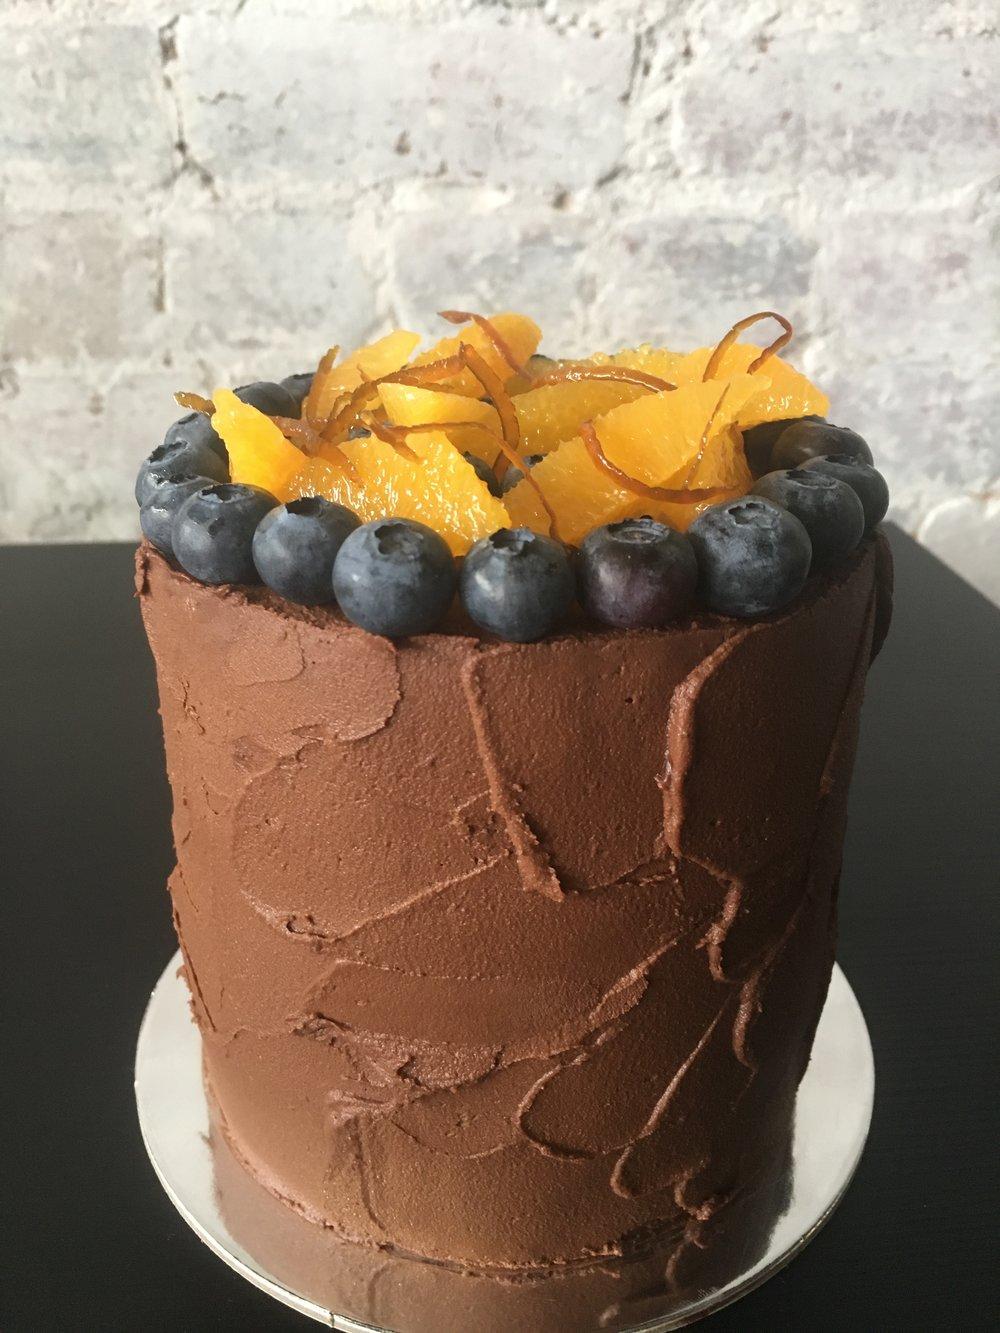 Vegan Jaffa - Almond and orange cake, with velvety chocolate ganache and fresh orange and blueberry. Rustic exterior.